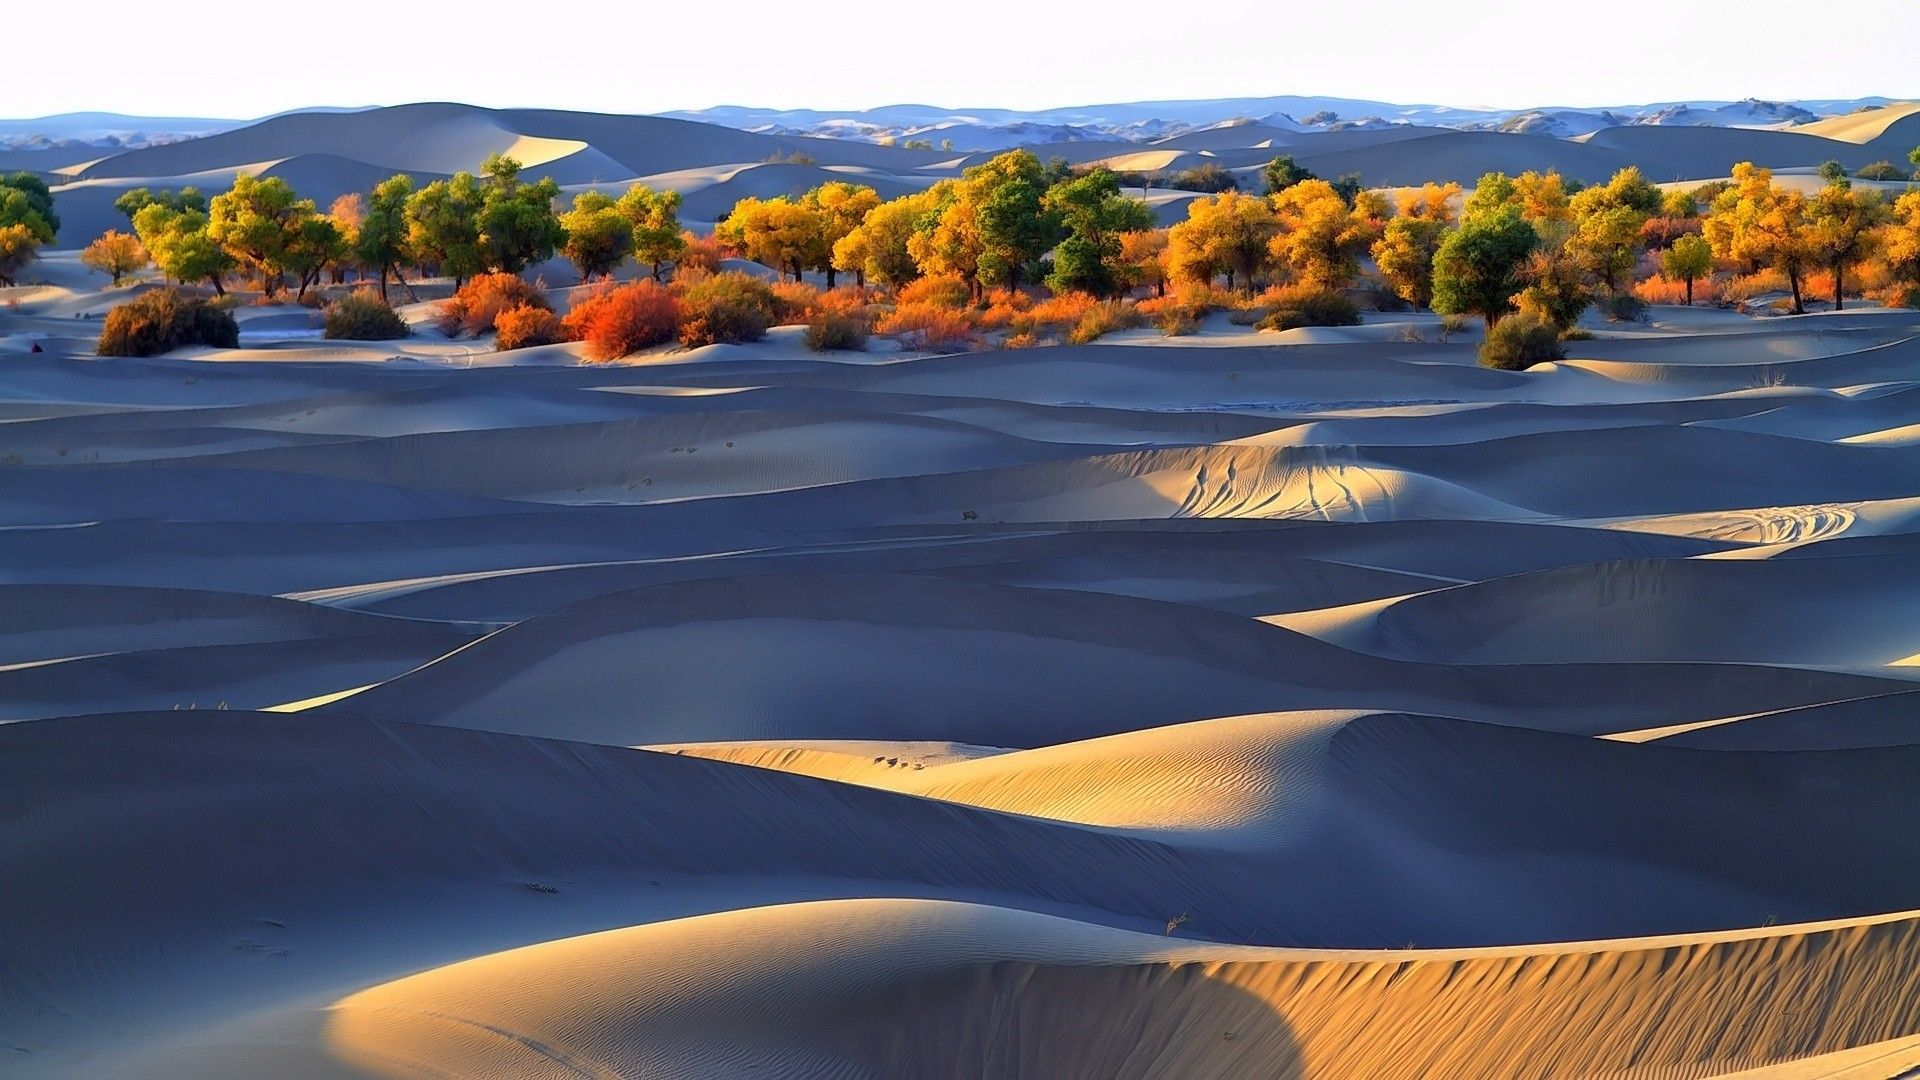 Autumn Trees In The Desert Hd Desert Wallpaper Nature Wallpapers Download Beautiful Hd Wallpaper 1080p 2160p Uhd 4k Hd Wallpaper Landscape Nature Wallpaper